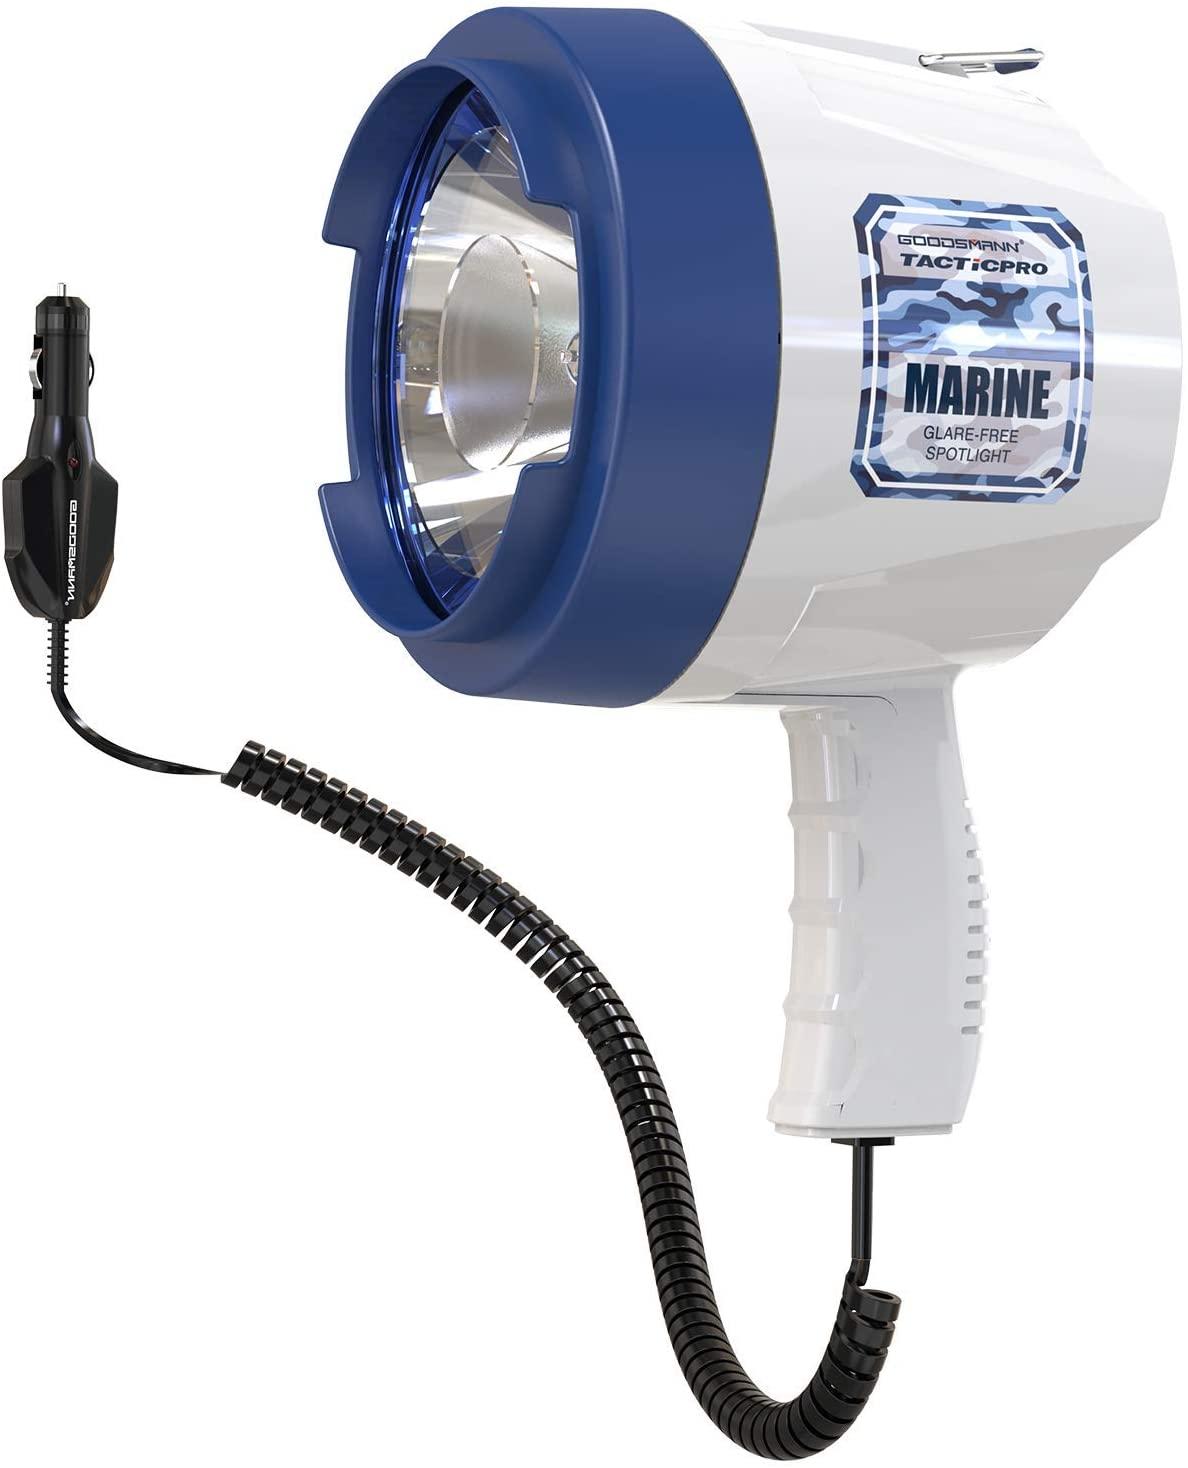 GOODSMANN Handheld Spotlight 1400 Lumens Best Flashlight Handheld and Floodlight for Fishing Hiking Camping Use 12V DC Car Charge